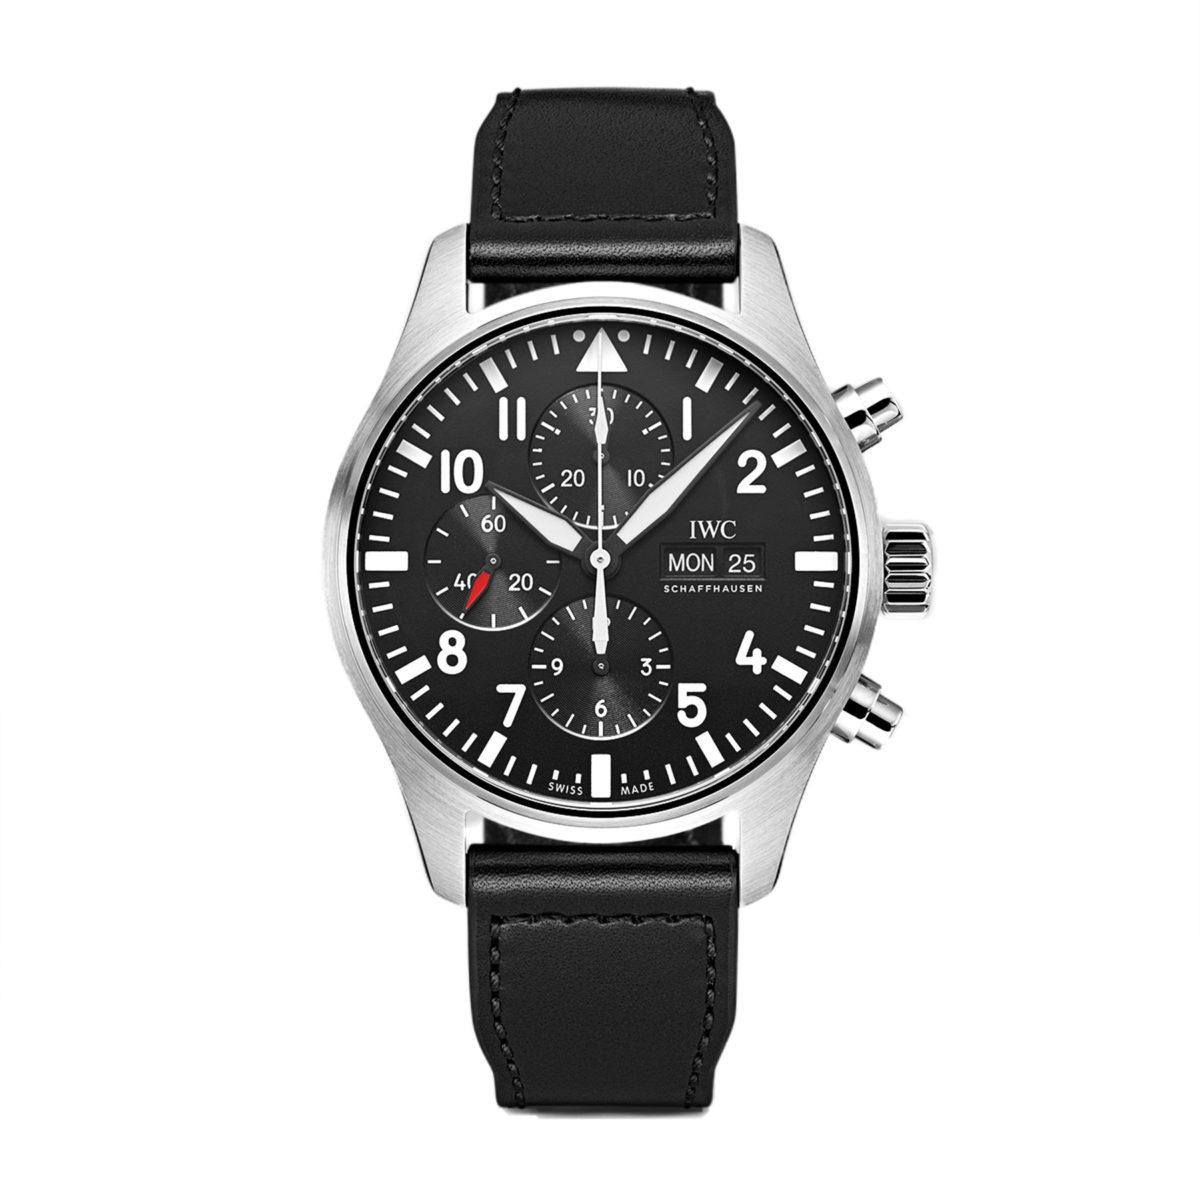 IW377709 — IWC Schaffhausen Pilot's Watch Chronograph